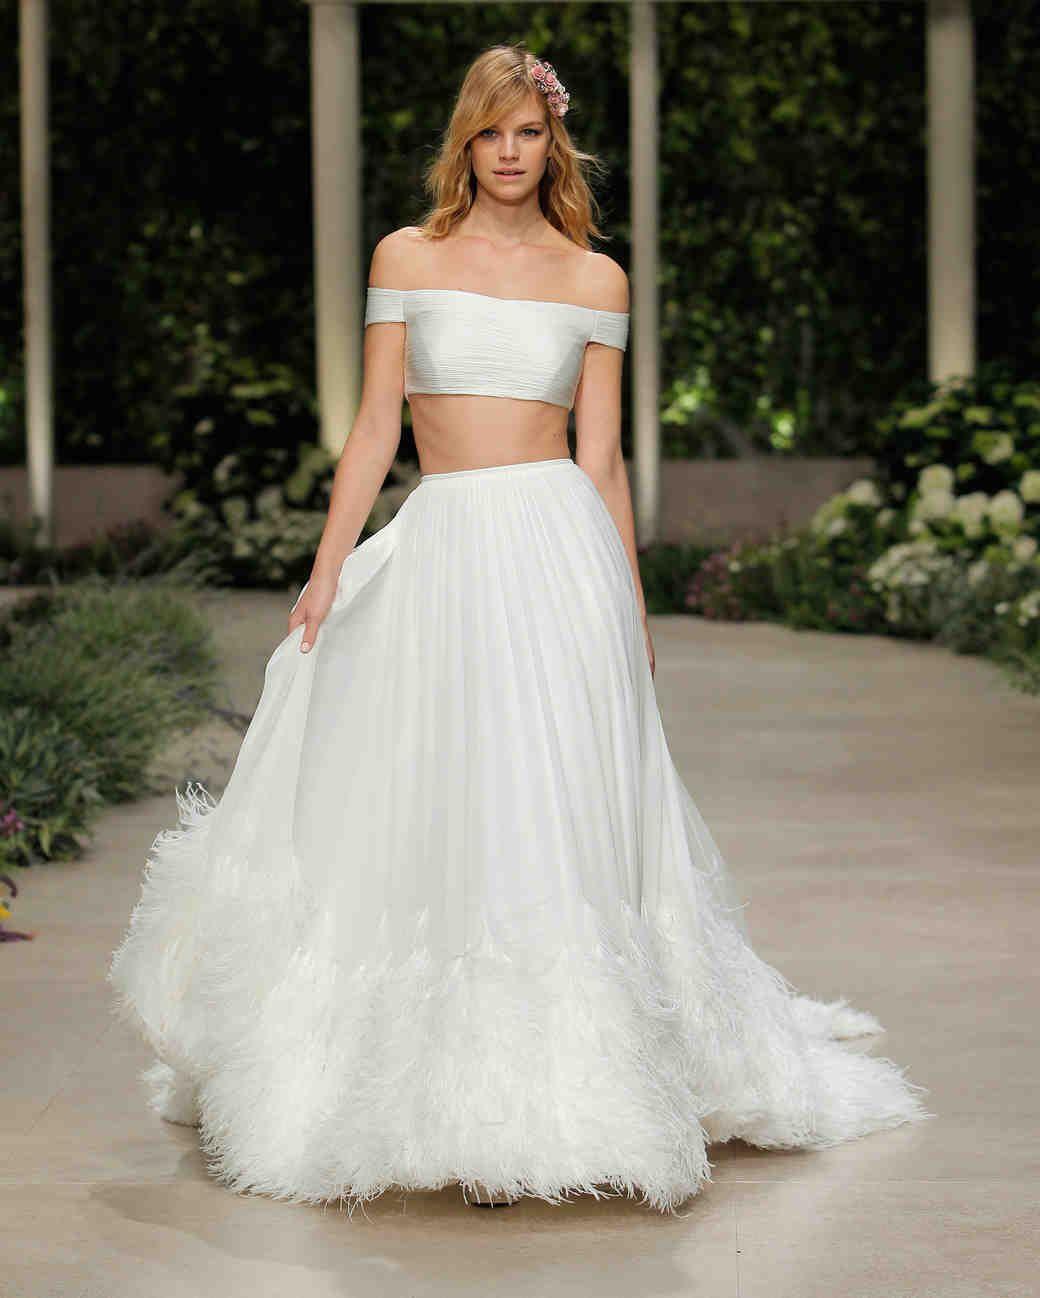 Black lace dress 3/4 sleeve may 2019 Pronovias Spring  Wedding Dress Collection  fashion Pronovias